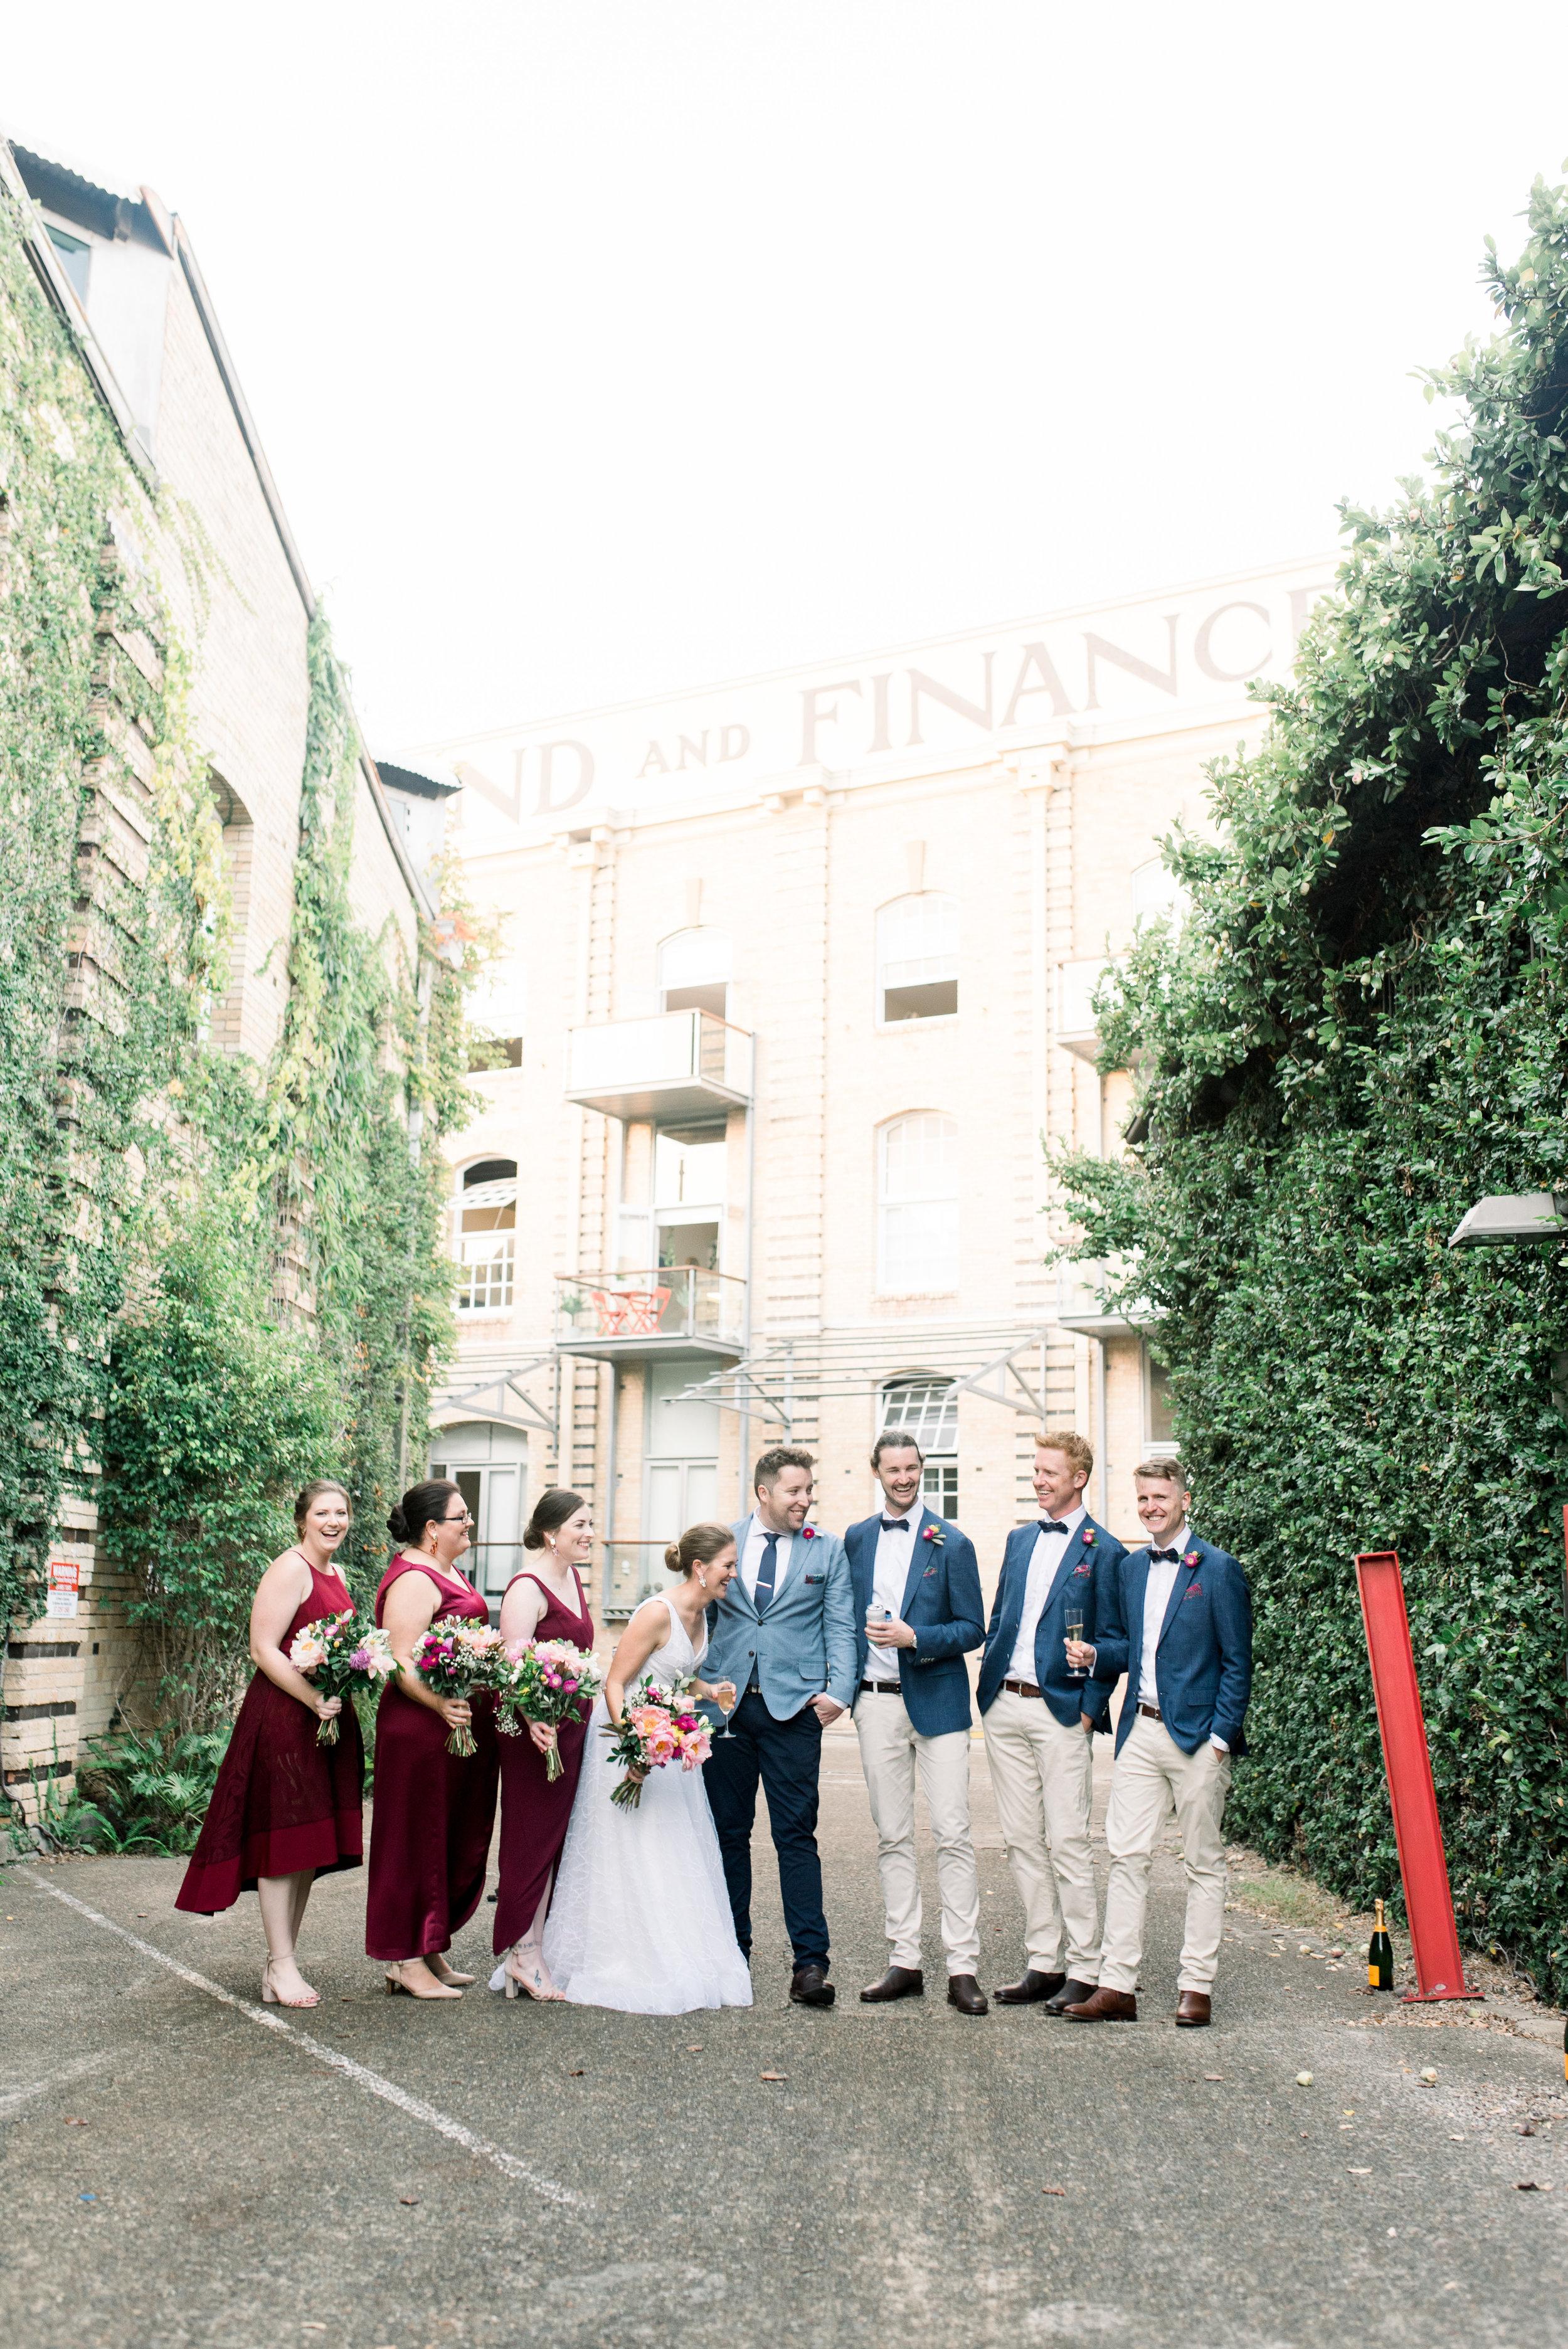 refinery-wedding-brisbane-city-wedding-photographer-73.jpg